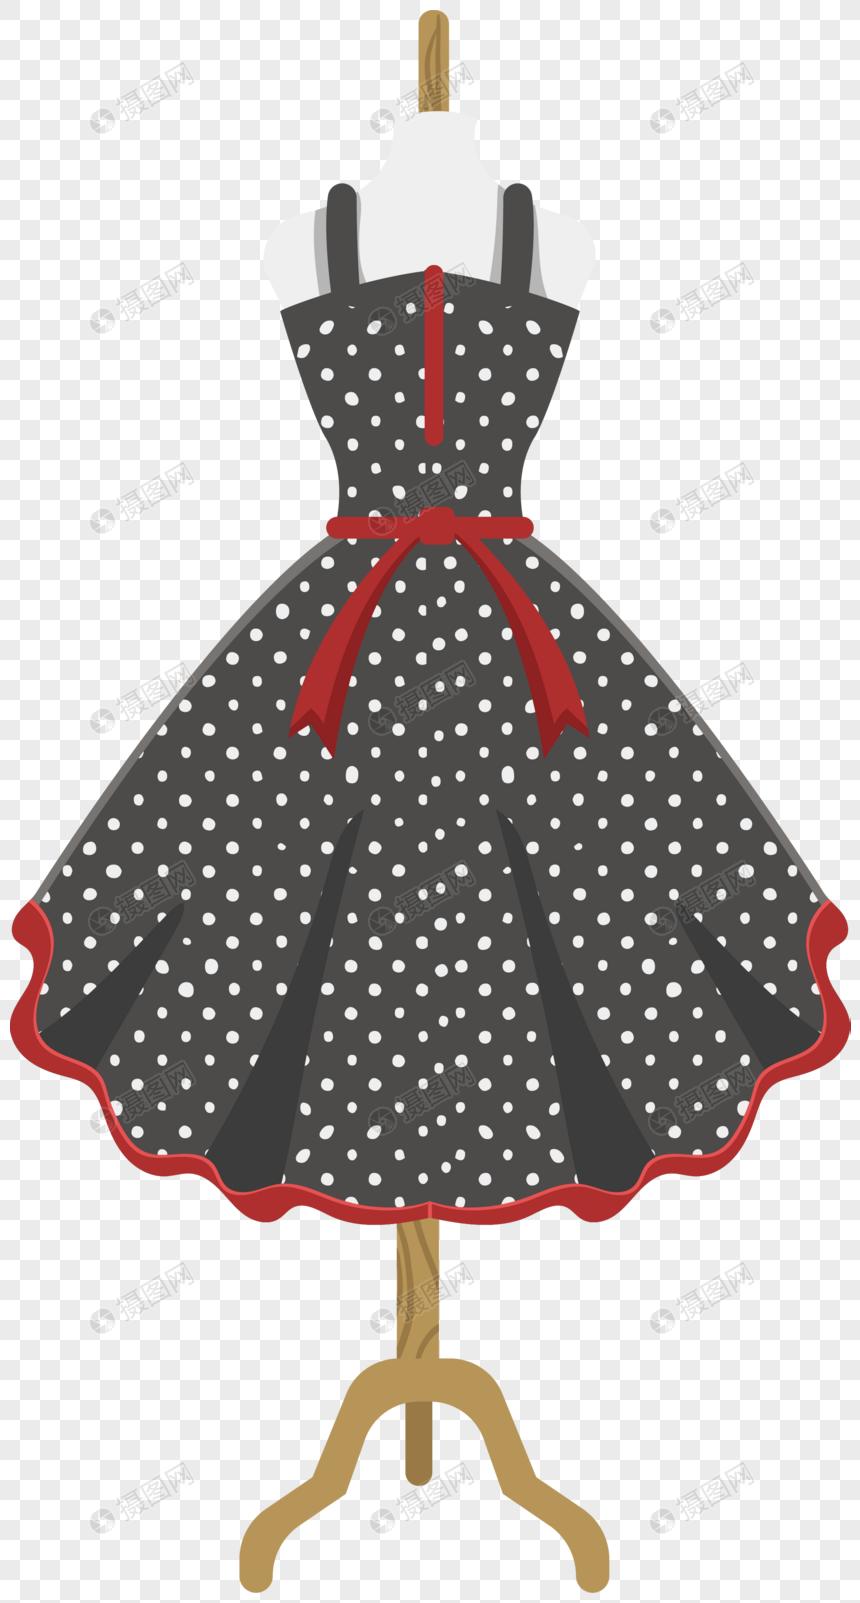 Kartun Hitam Putih Dot Suspender Skirt Element Gambar Unduh